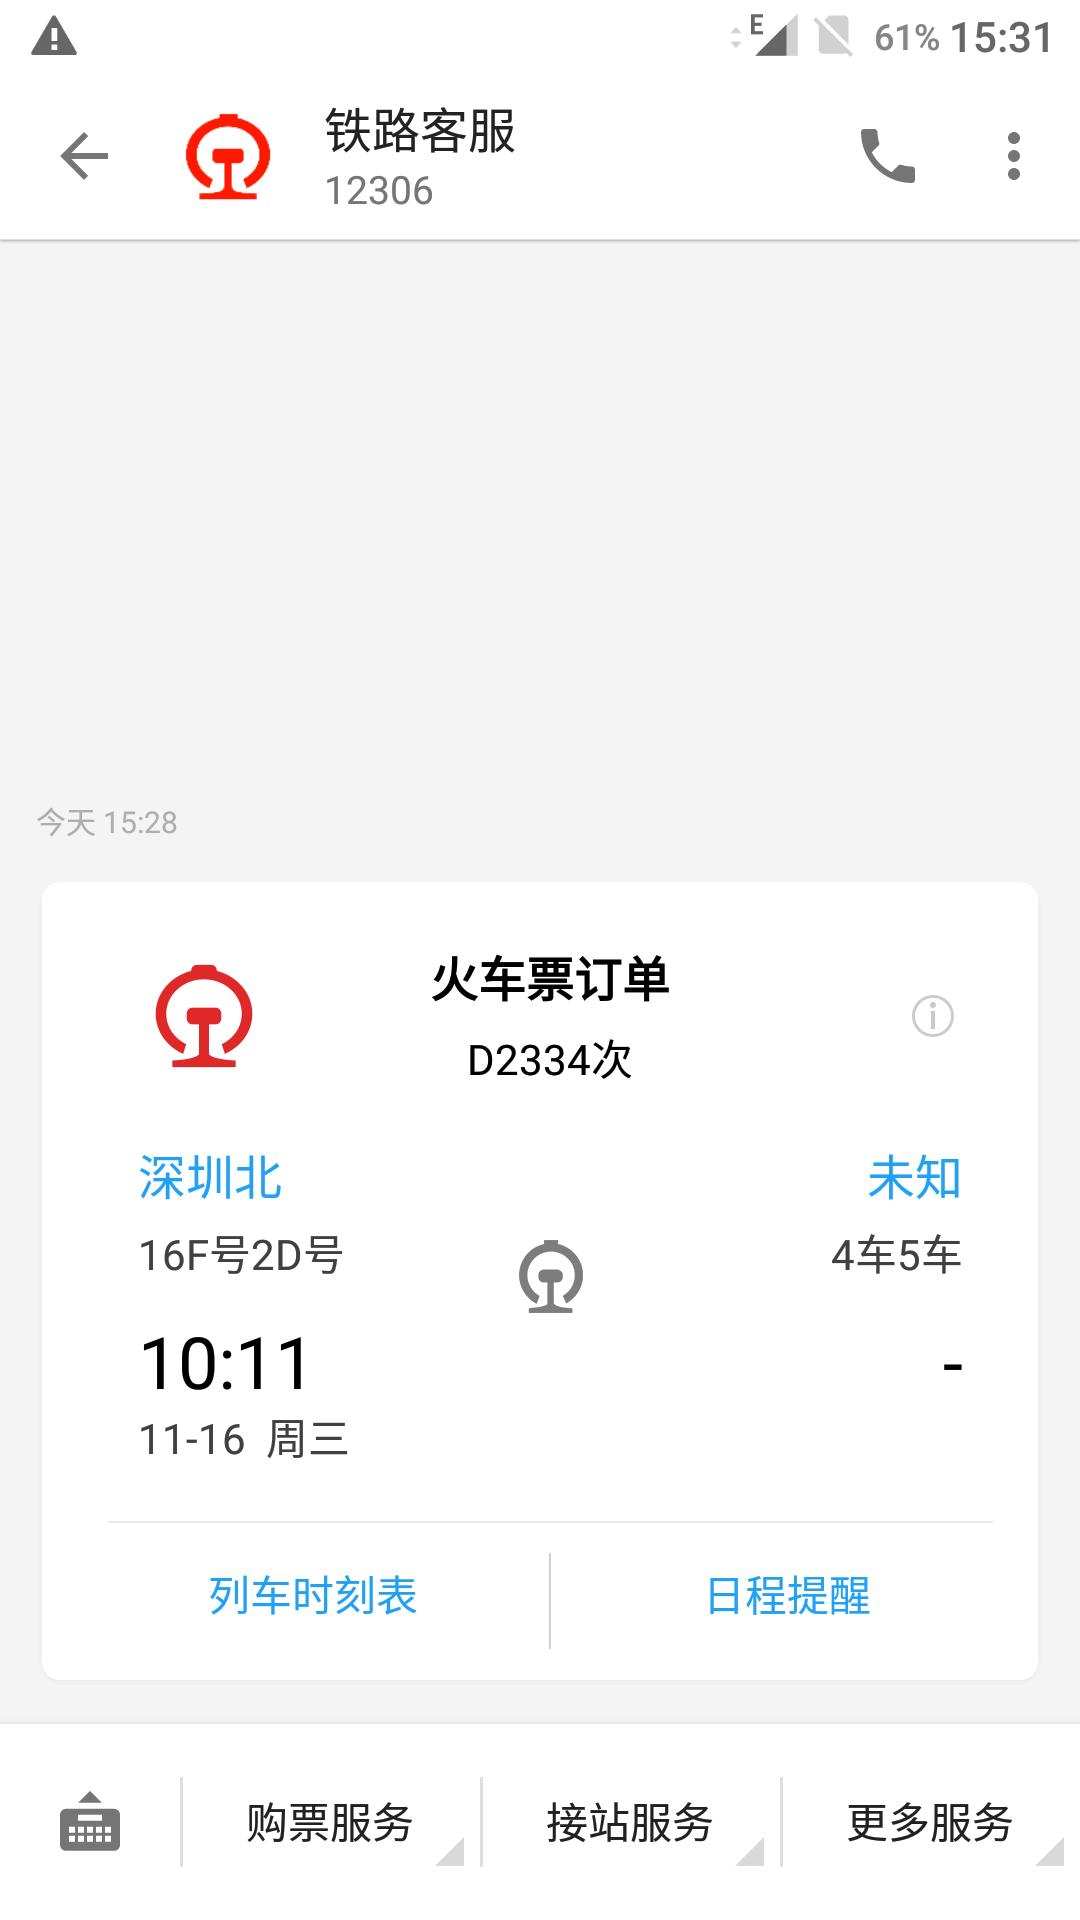 Screenshot_20161115-153113.png